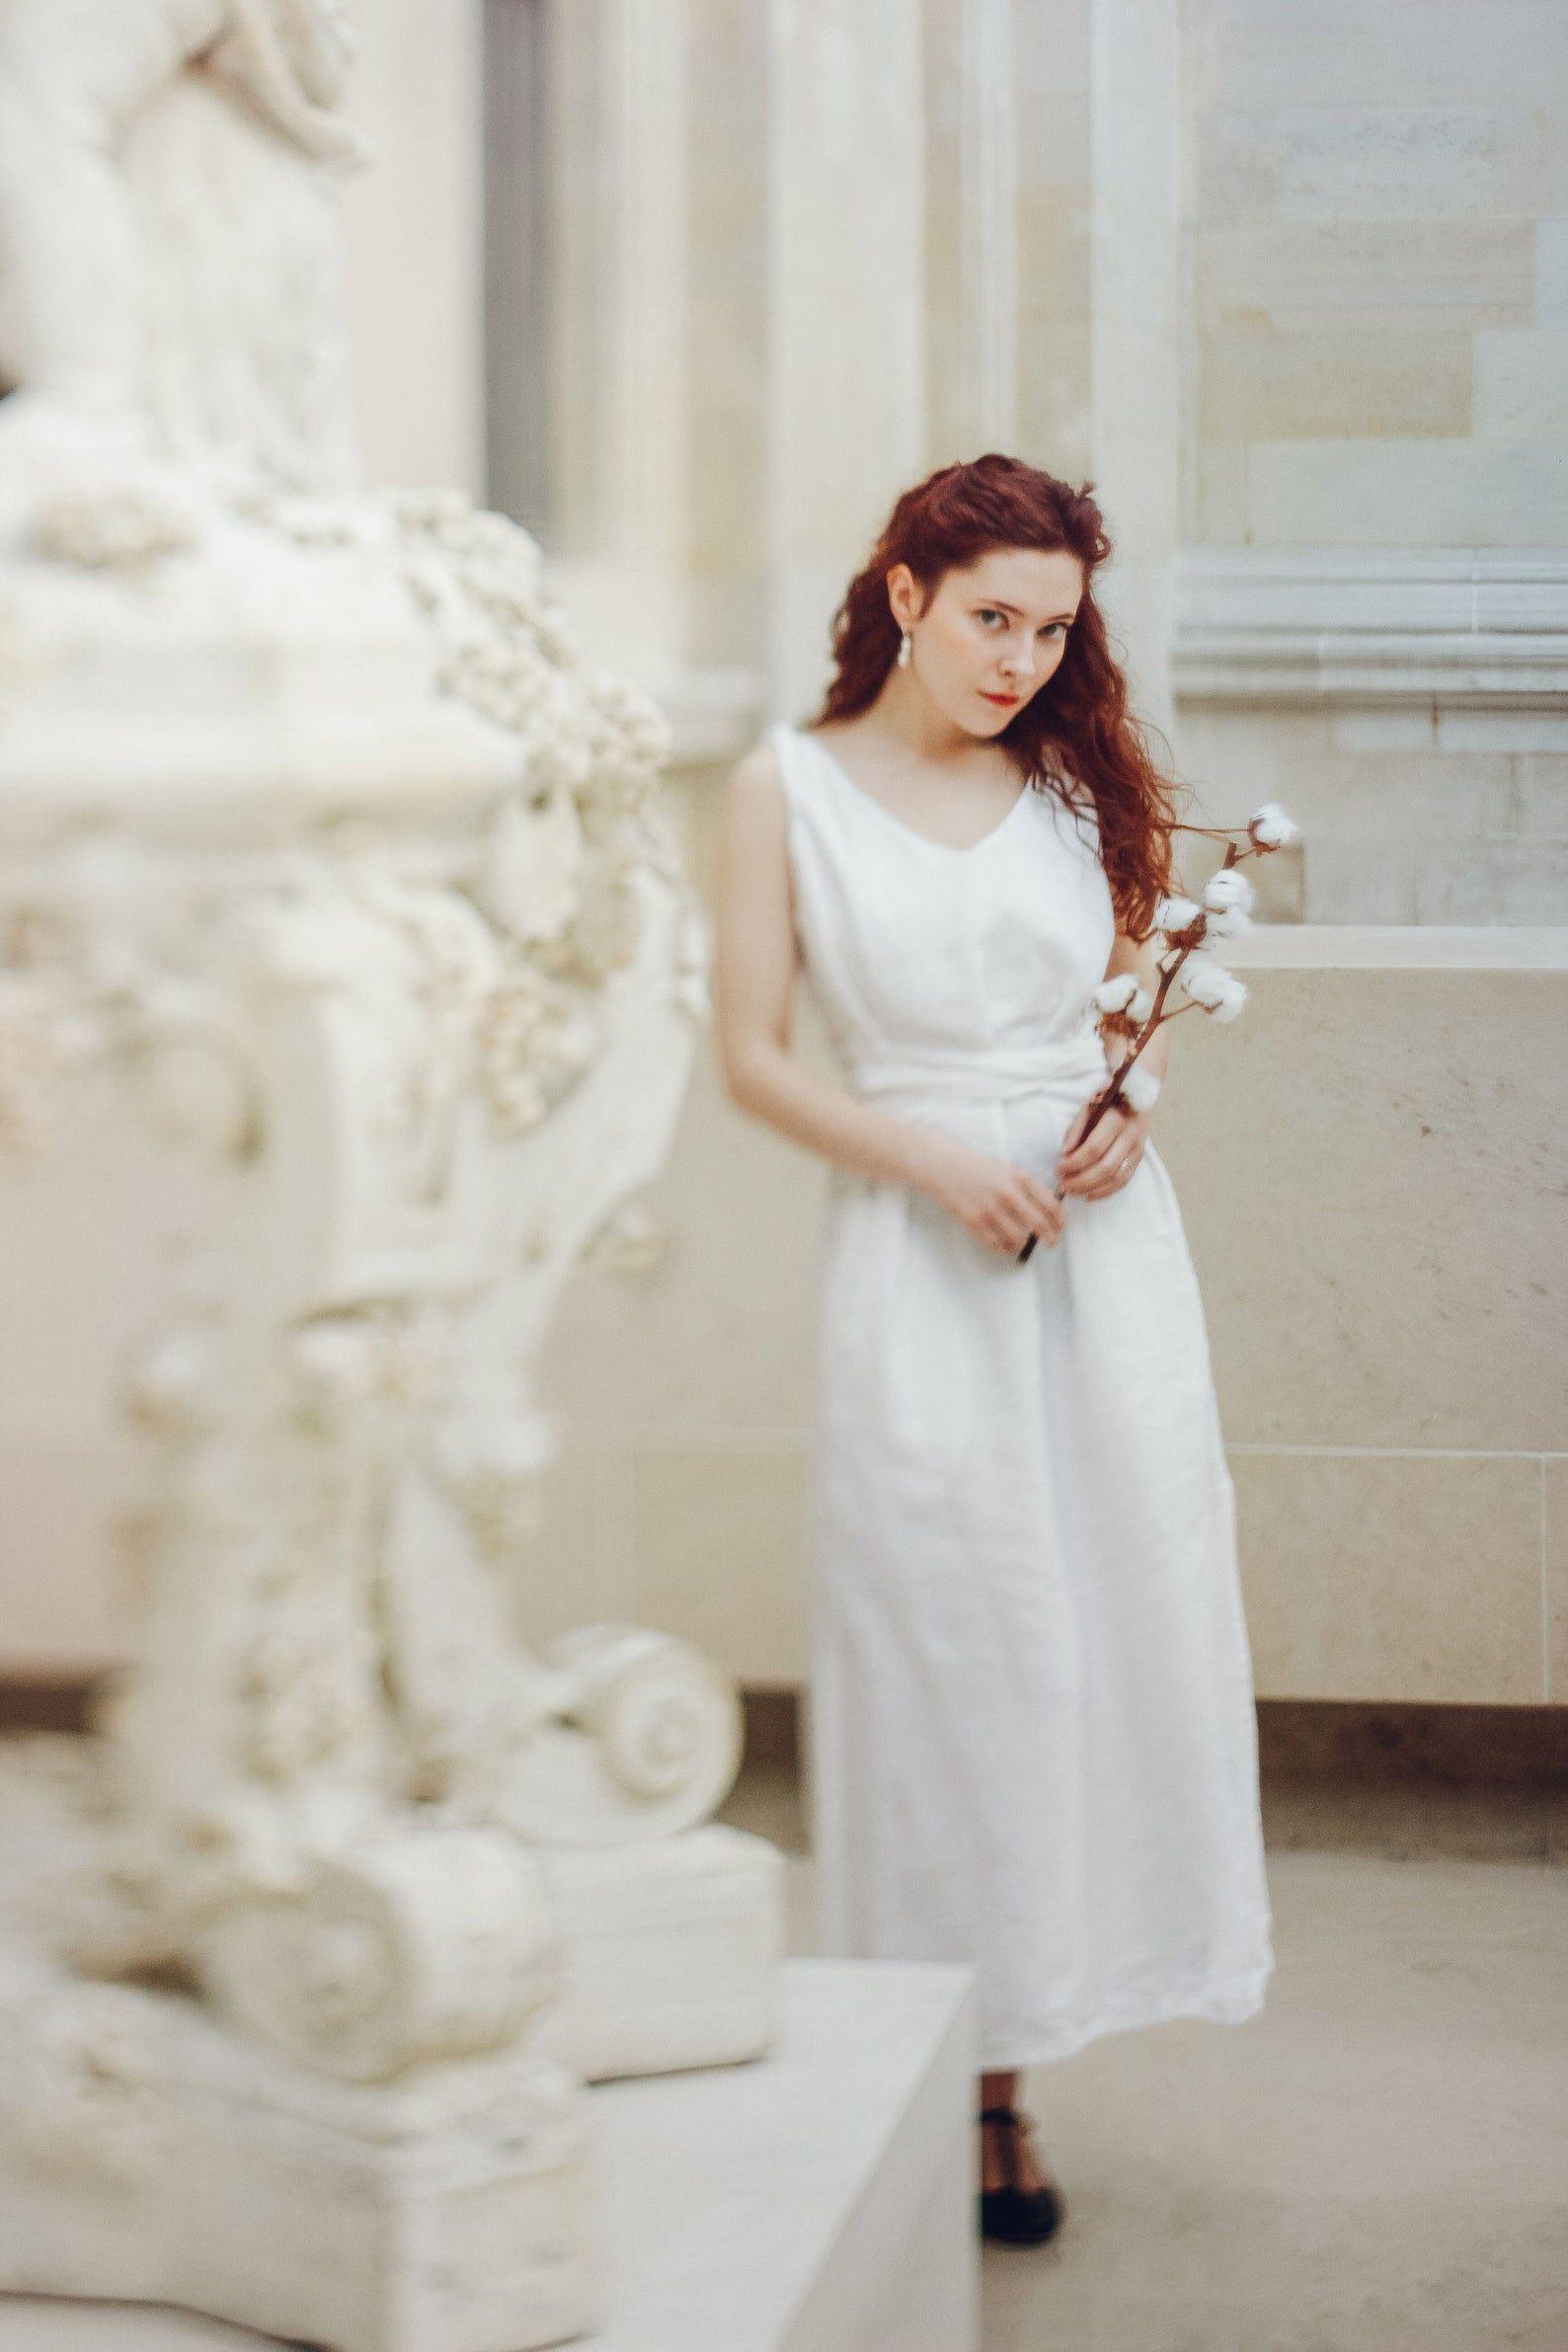 Simple Wedding Dress White Linen Dress Etsy Linen Wedding Dress Wedding Dresses Simple White Linen Dresses [ 2382 x 1588 Pixel ]